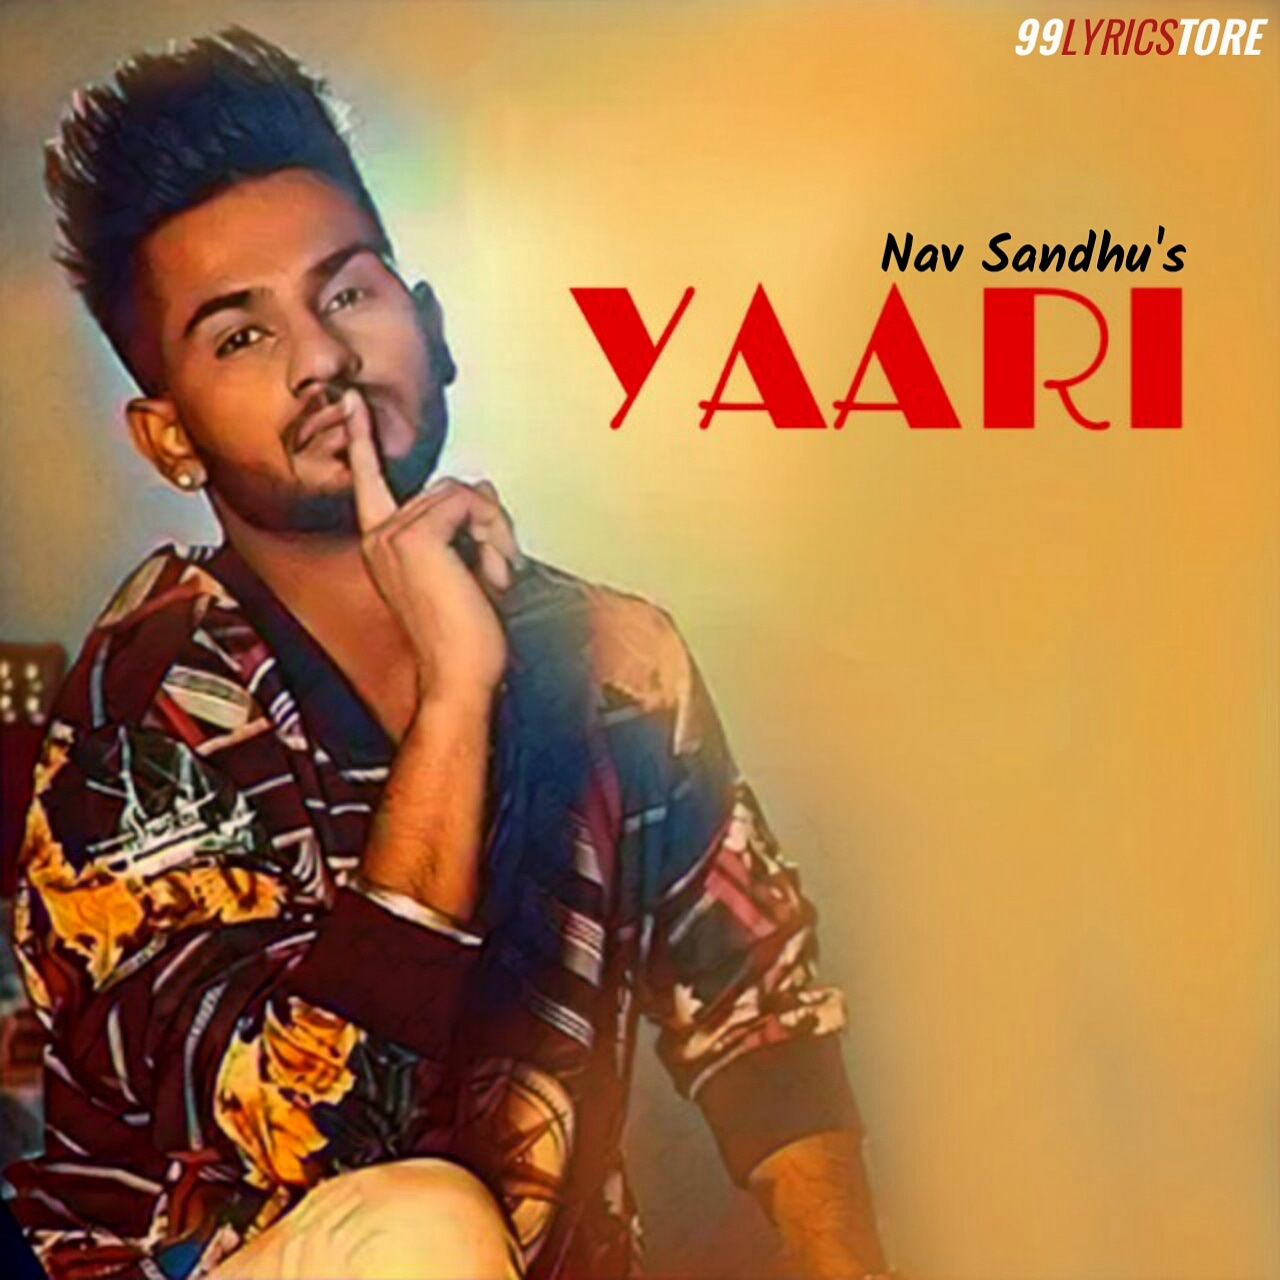 Yaari Punjabi Song Lyrics Sung by 'Nav Sandhu'